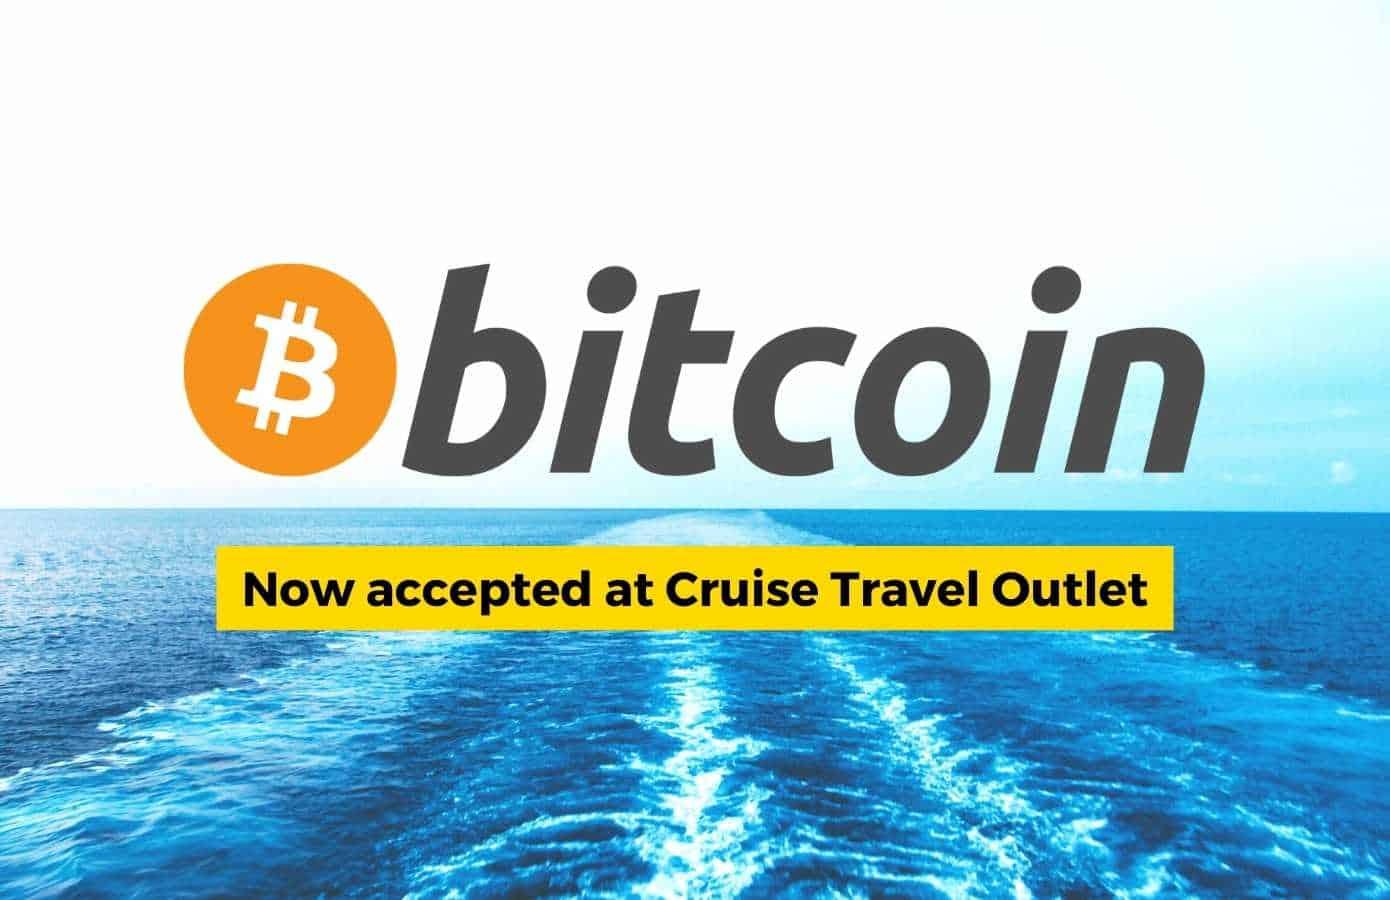 Bitcoin logo and text